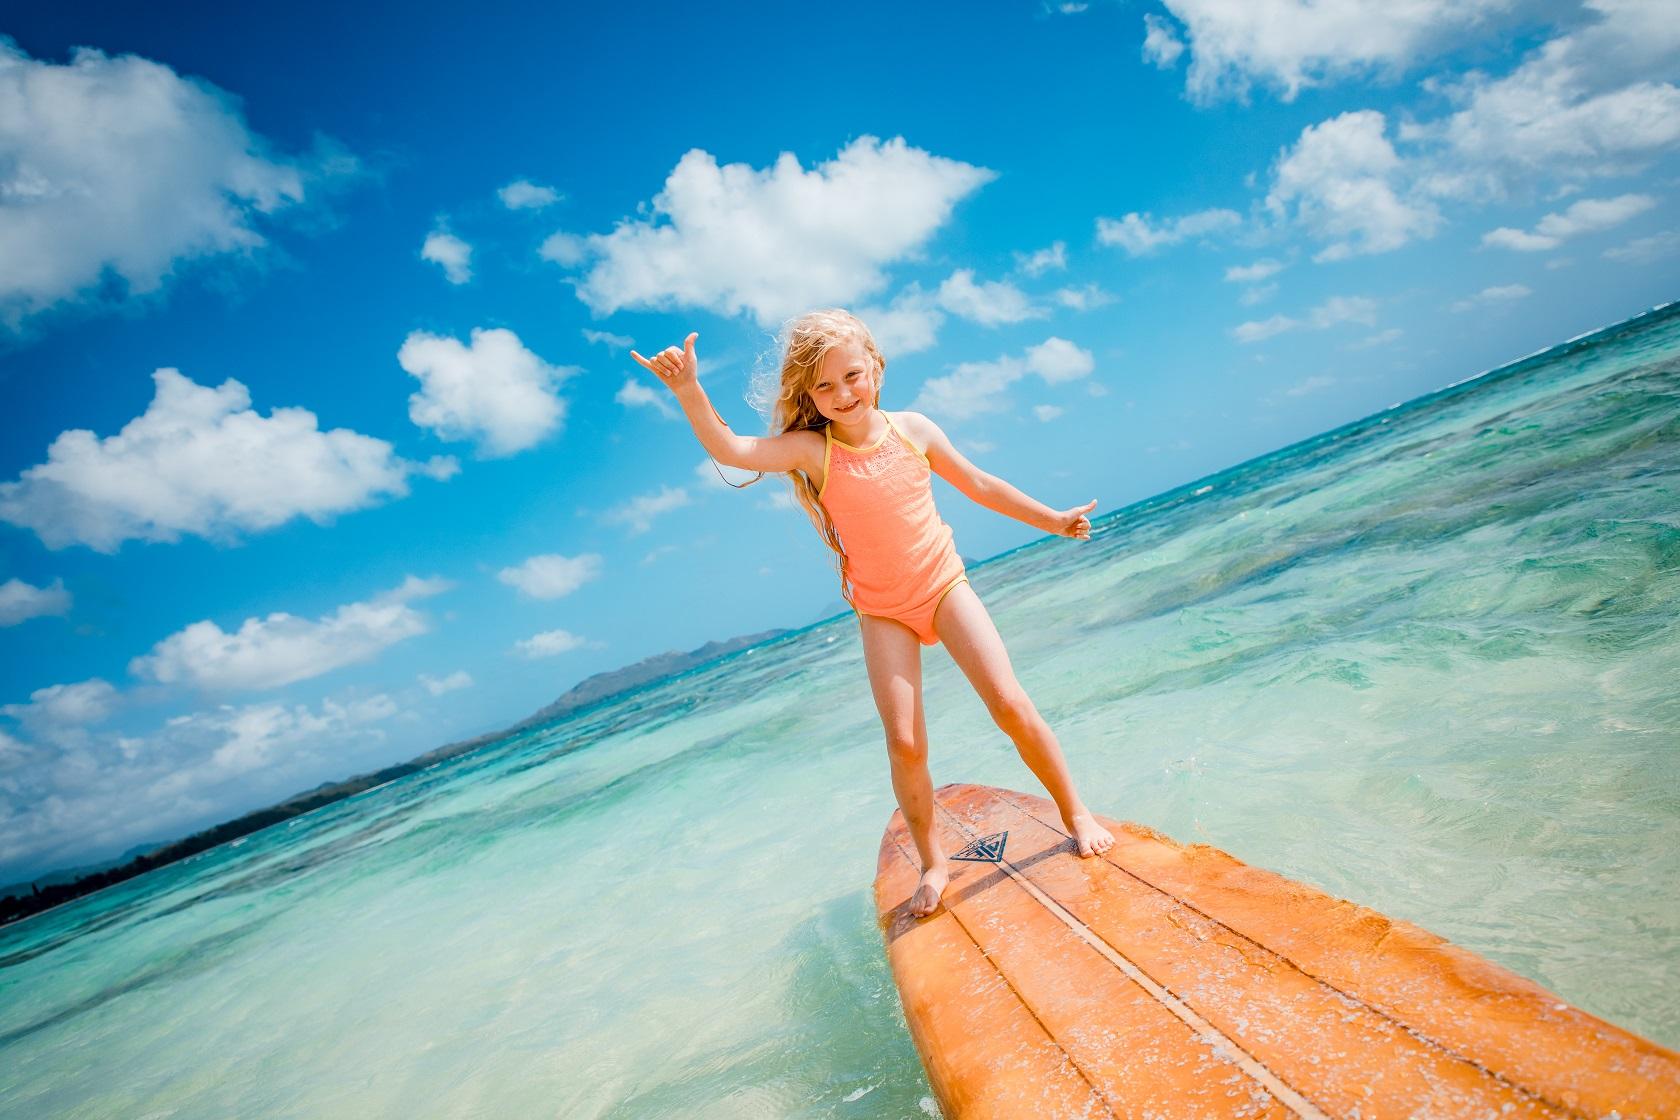 surfer girl kid family beach surfboard portrait